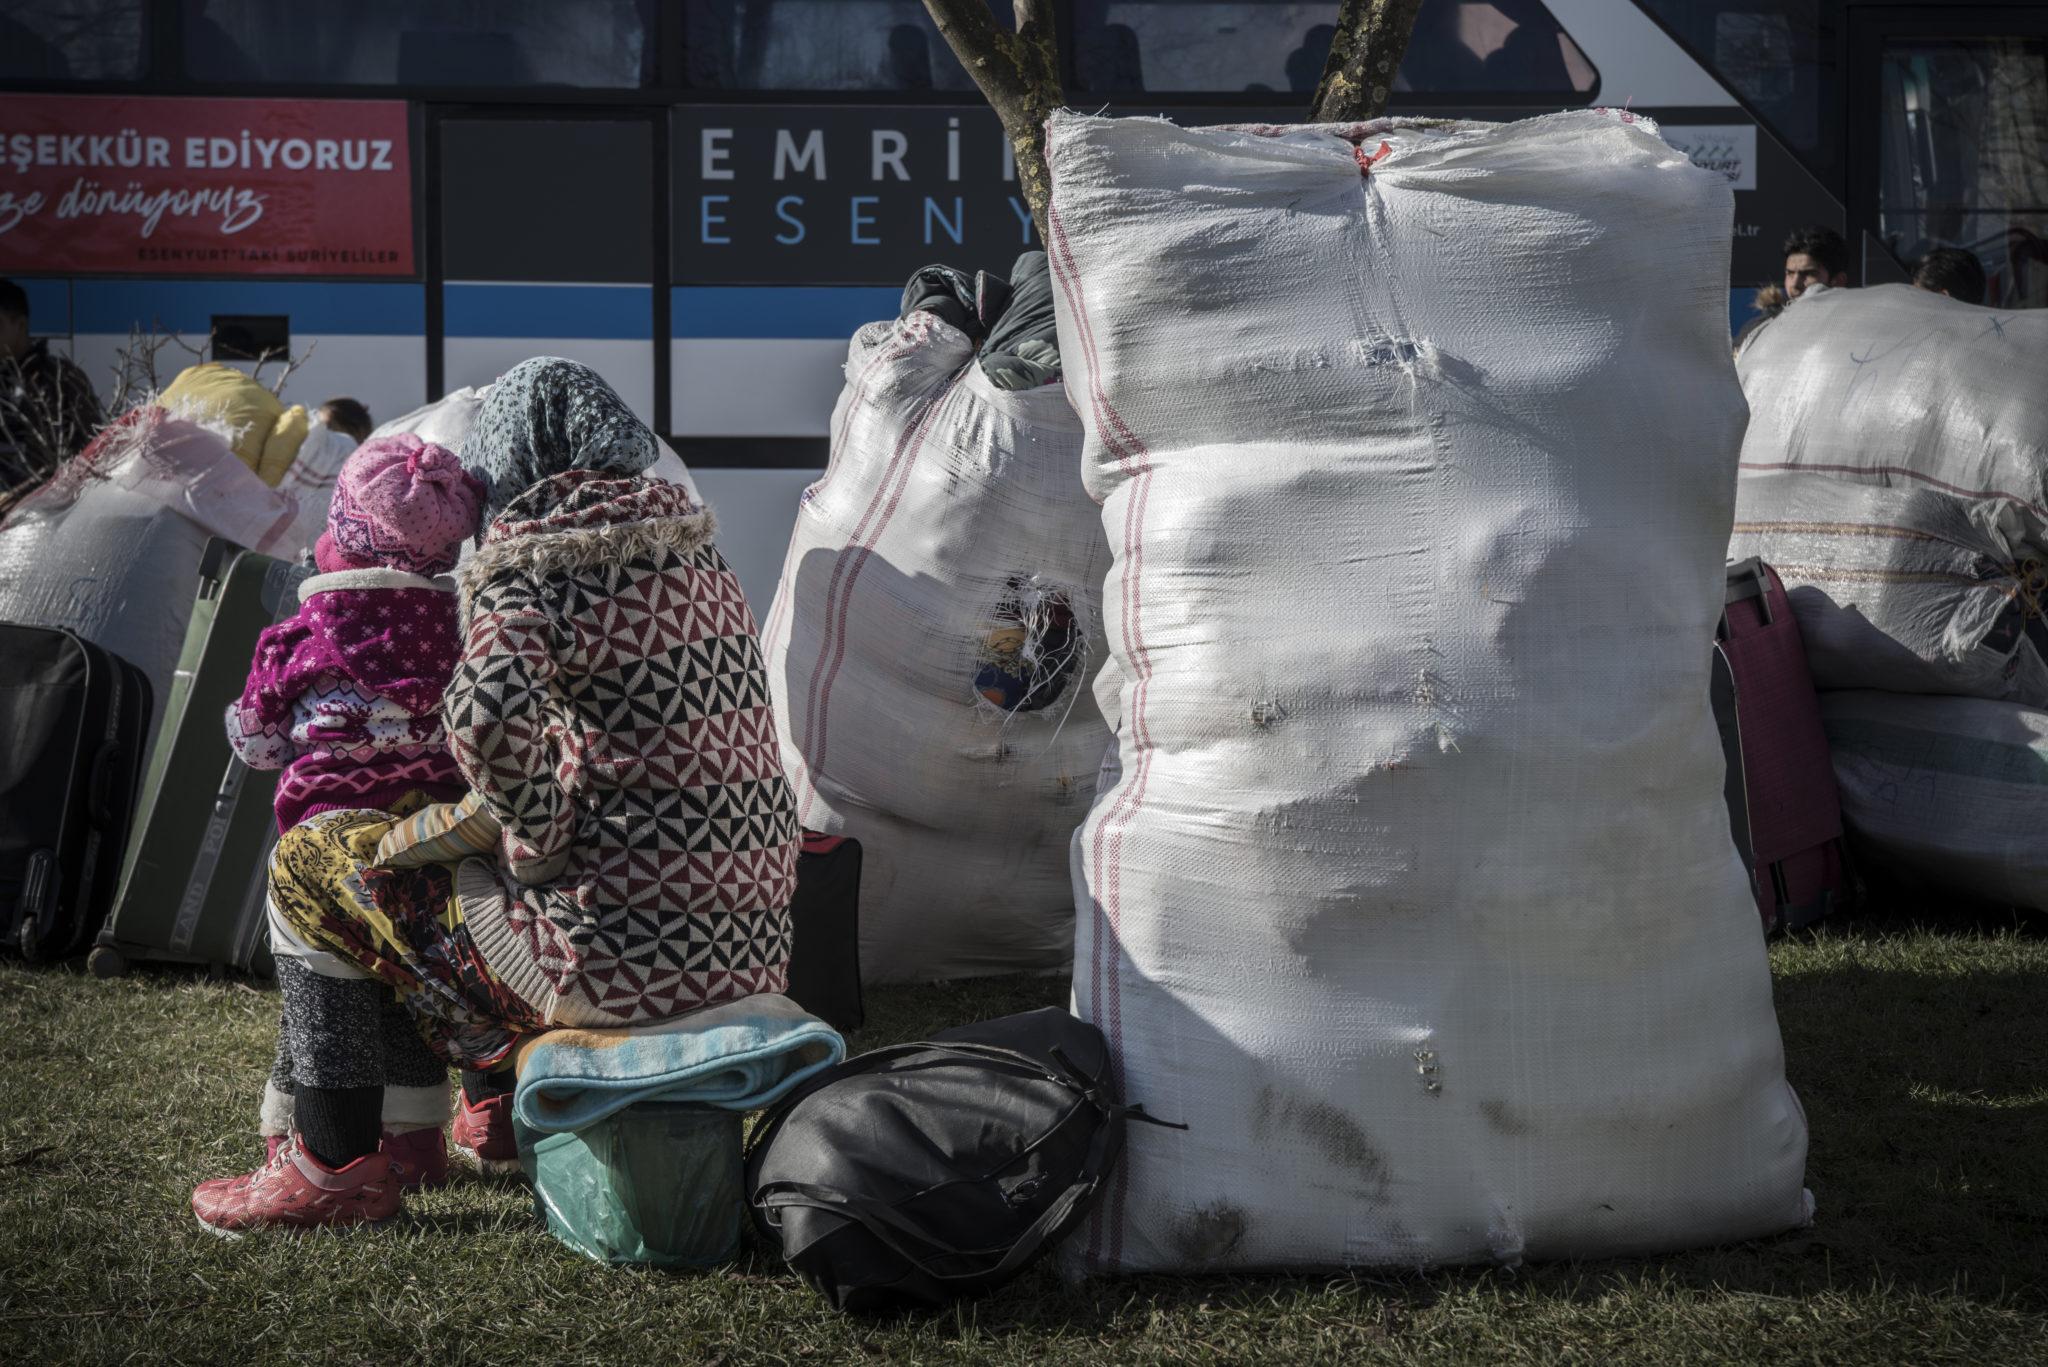 Turkey: Stop unlawful deportations of Syrians